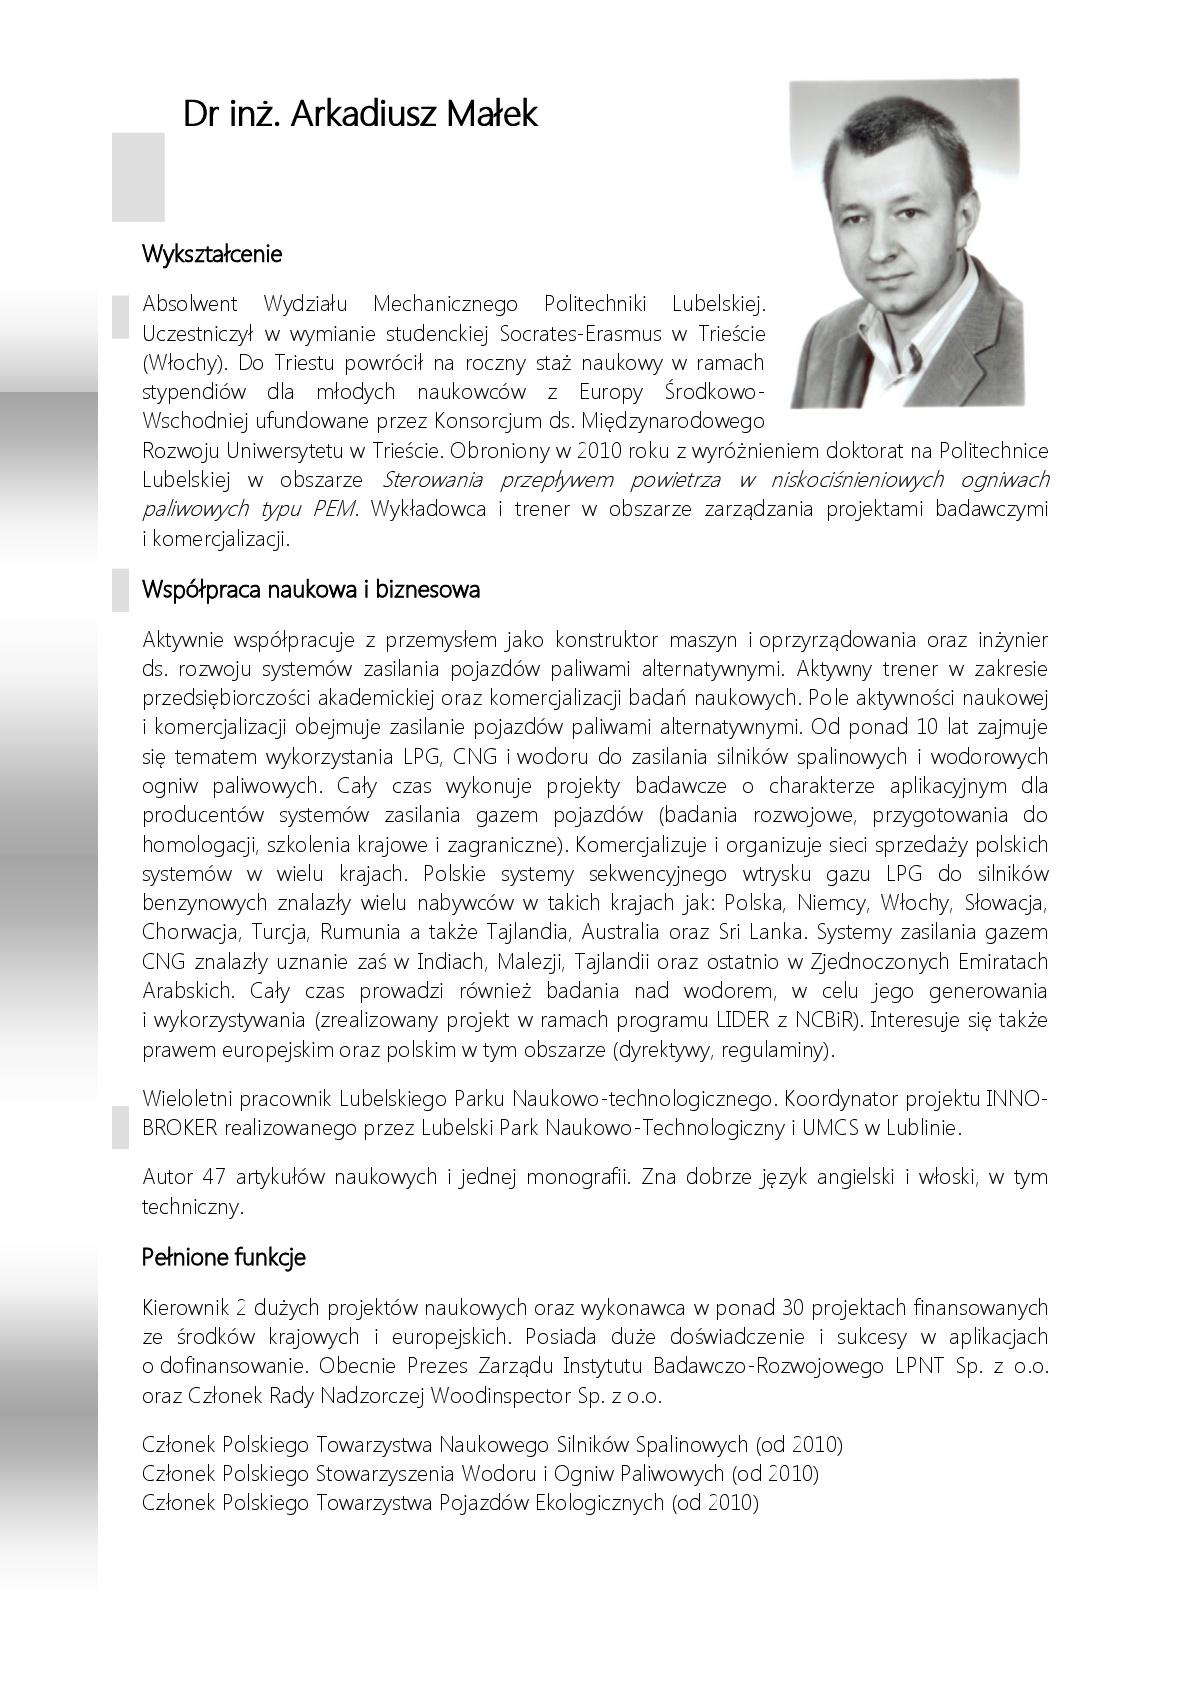 Arkadiusz Małek notka 2018.11.08-001.jpg